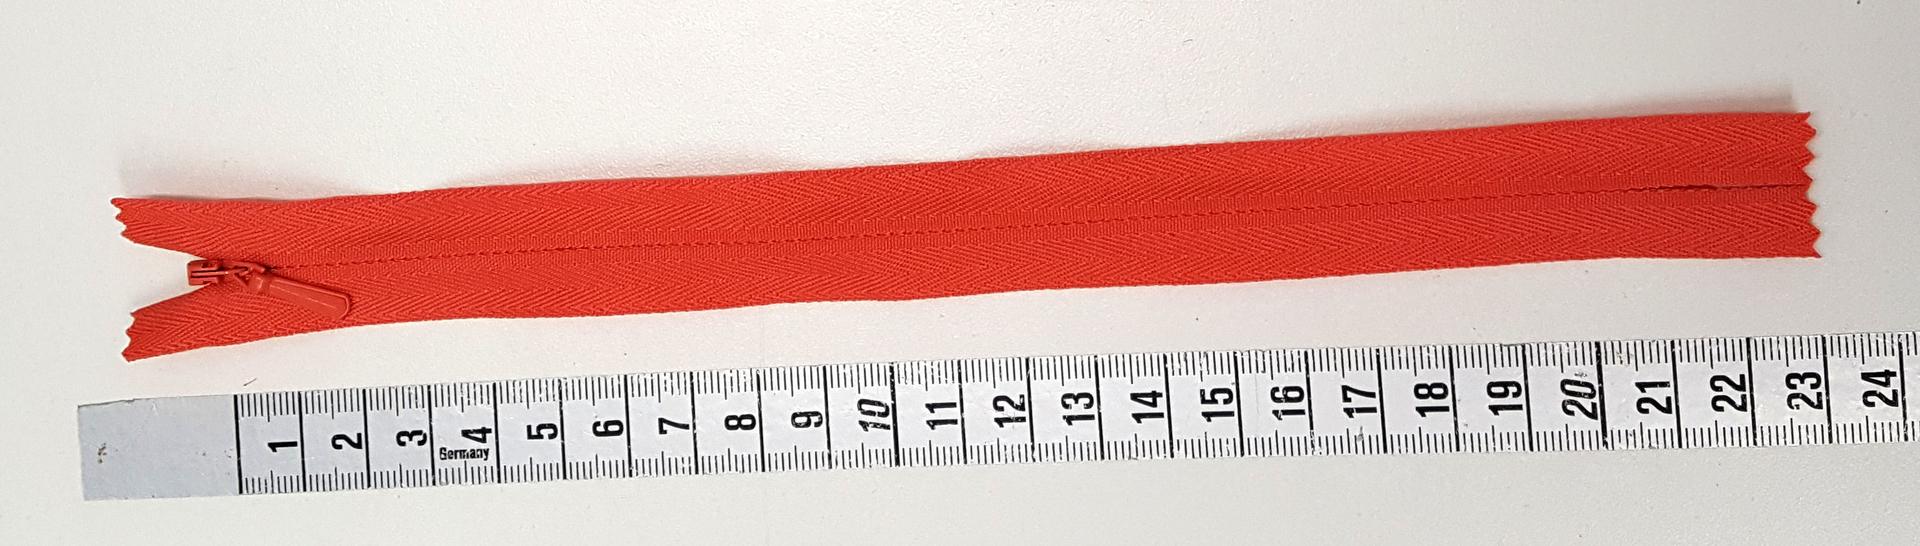 zelfklevende centimeterband